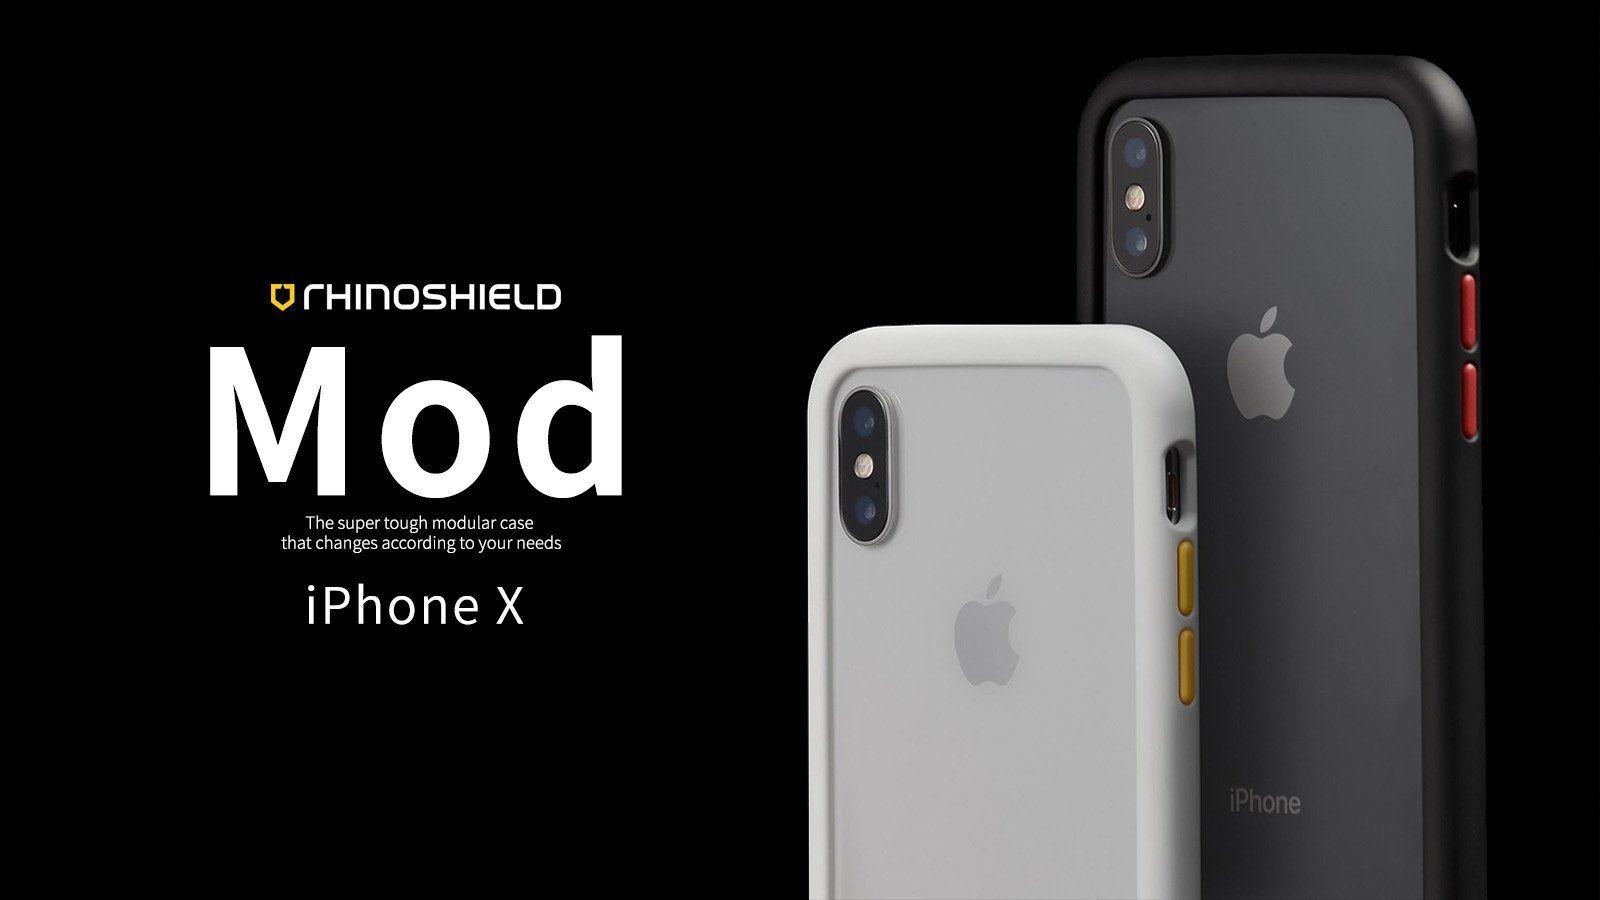 Rhino Shield MOD 邊框背蓋兩用殼 iPhone X Iphone